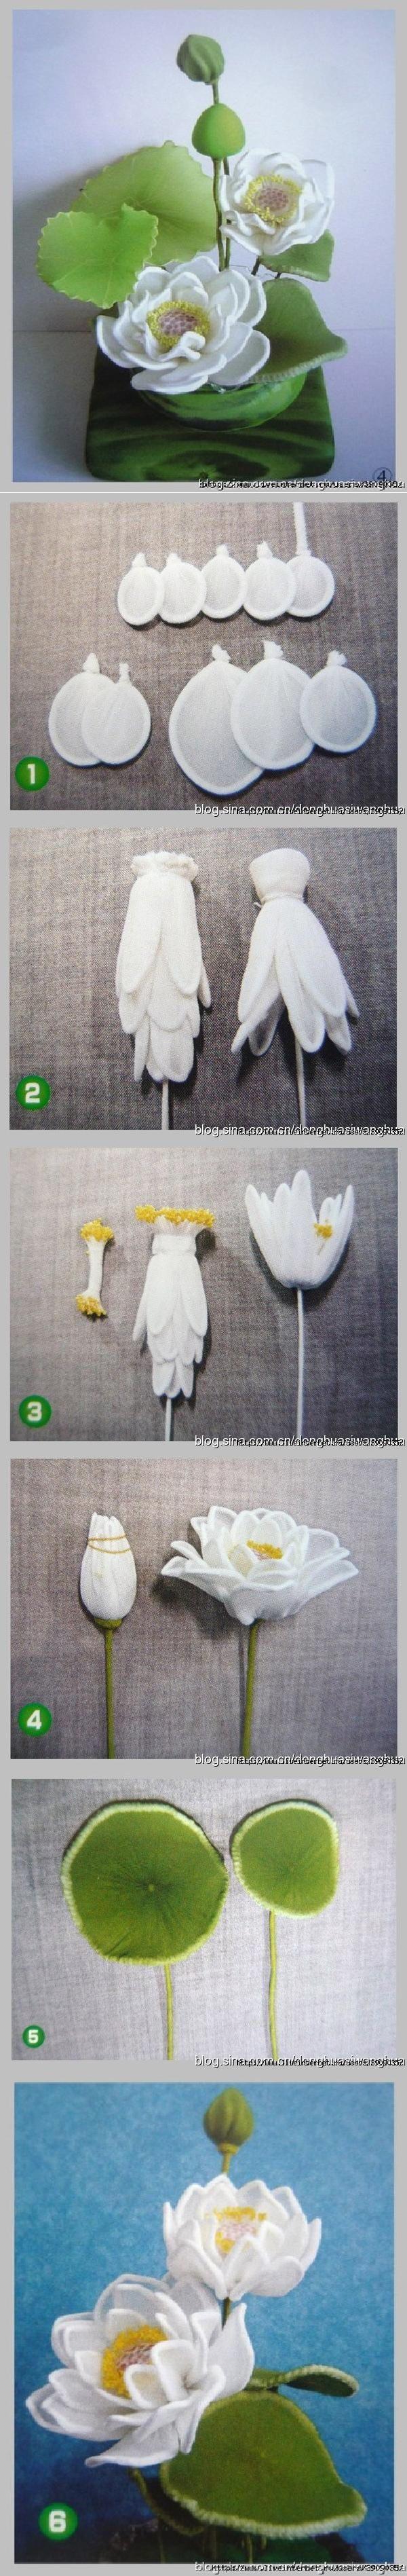 DIY Nylon Lotus Flower DIY Proyectos